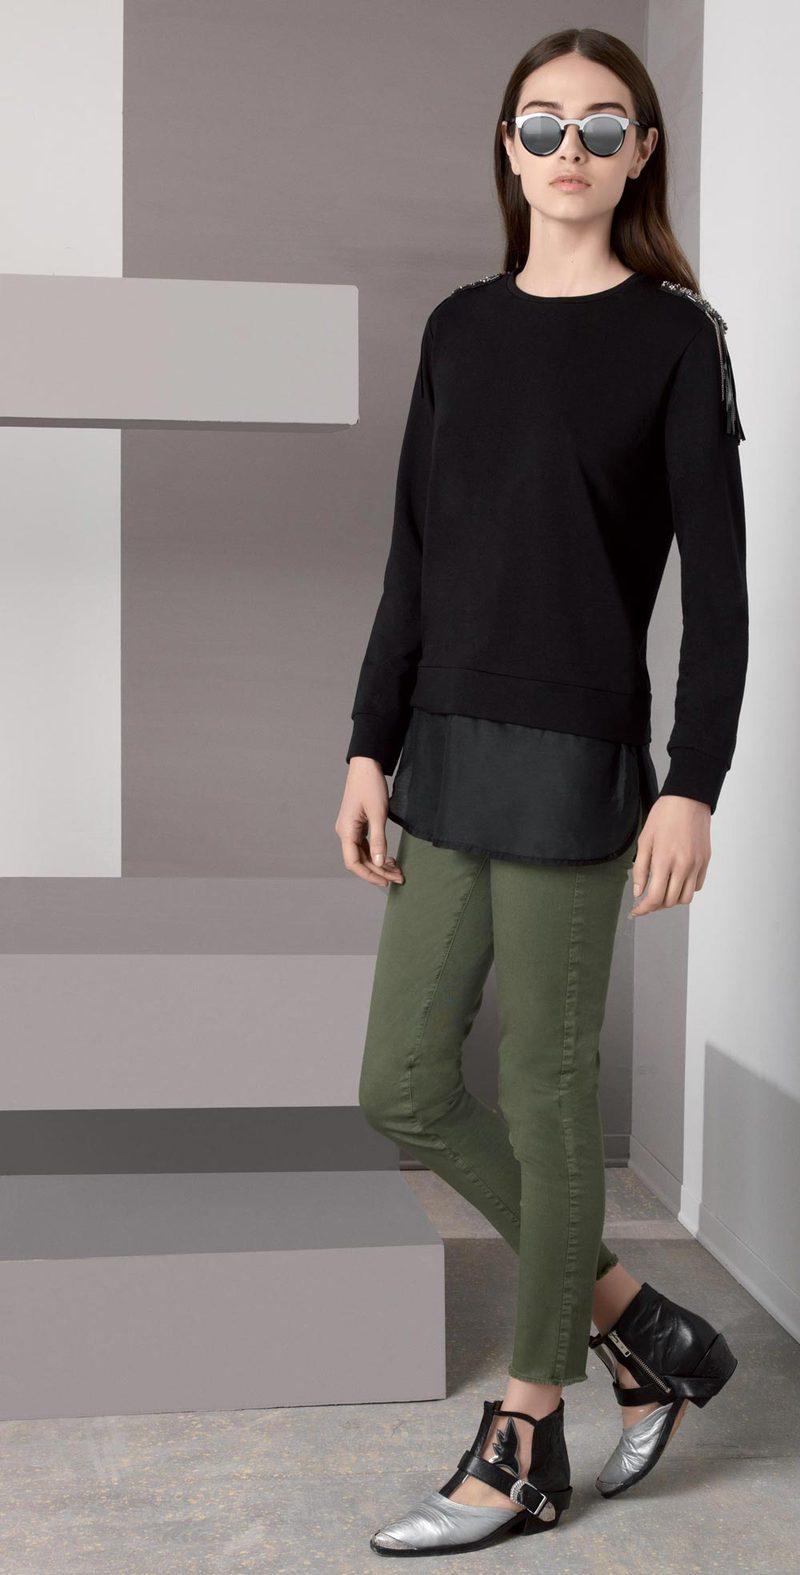 Black sweatshirt with applications